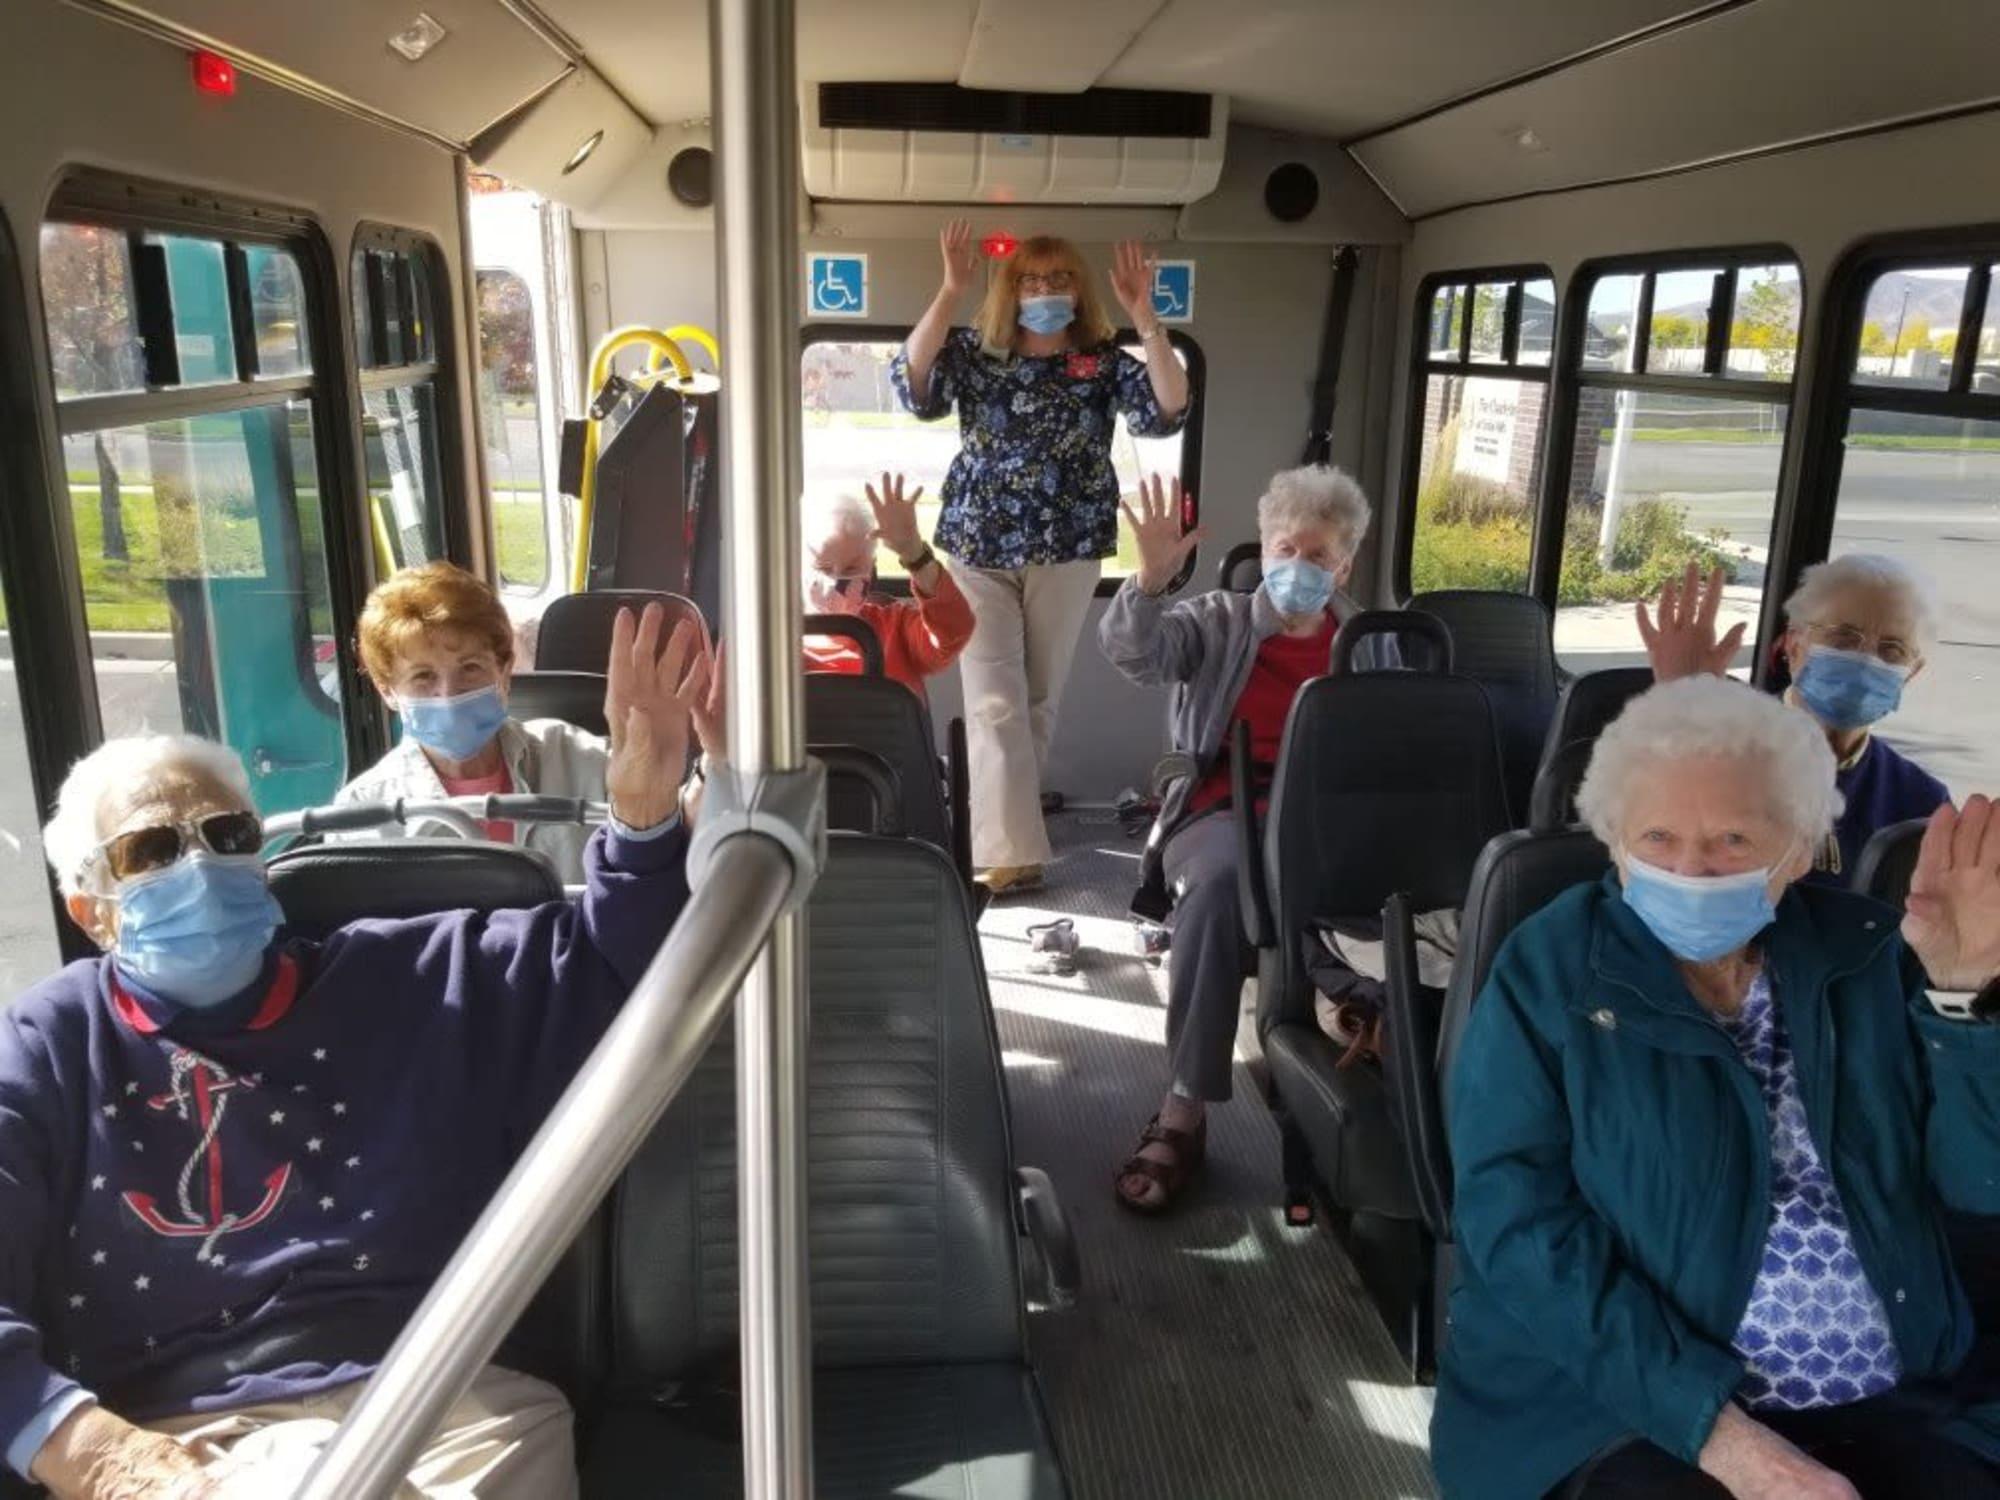 Riding a bus at The Charleston at Cedar Hills in Cedar Hills, Utah